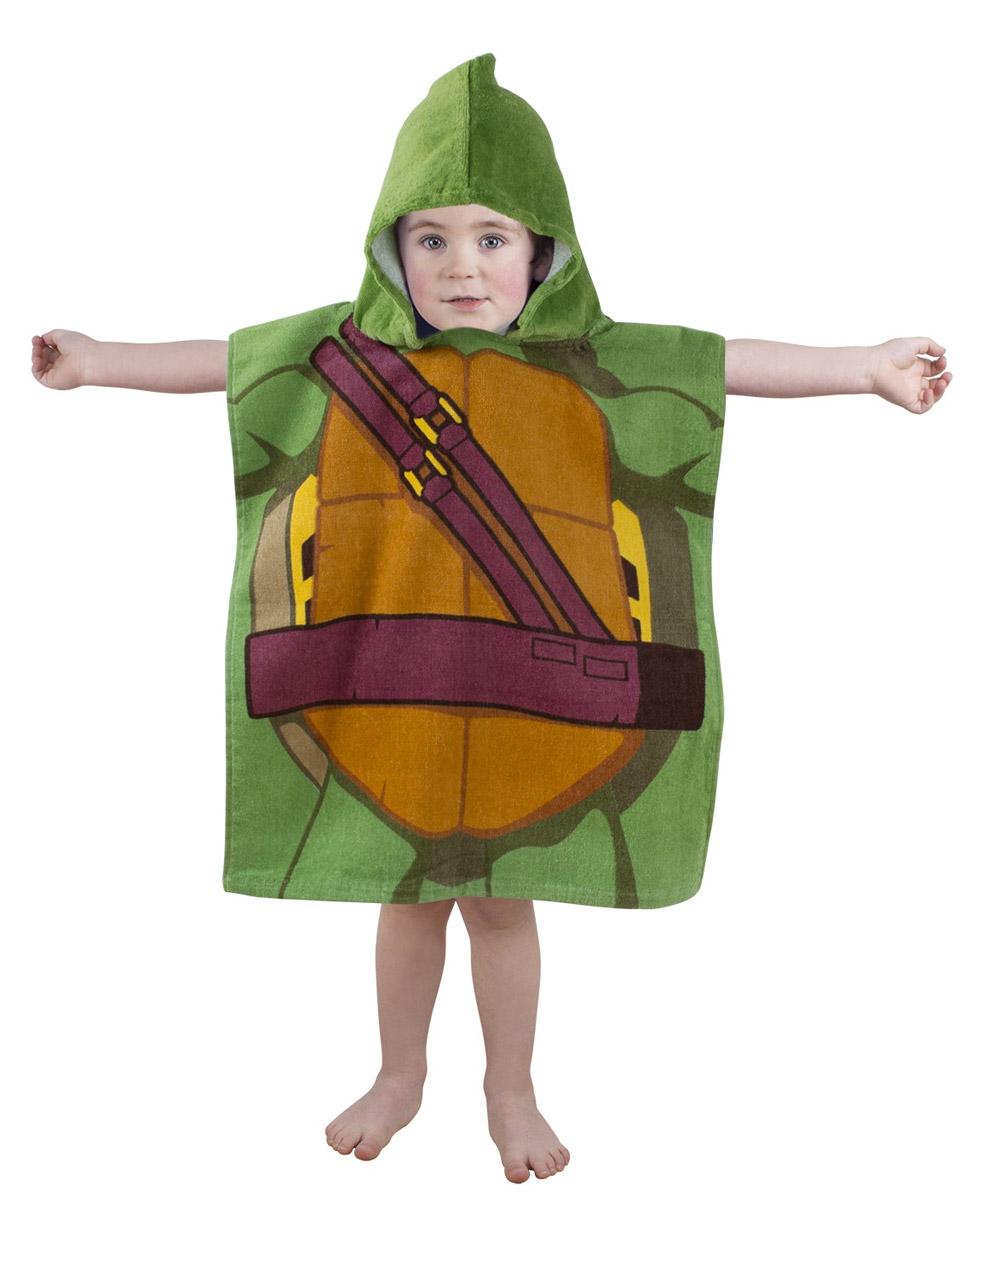 Teenage Mutant Ninja Turtles Towel (Hooded Poncho) Dudes 115 x 50 cm